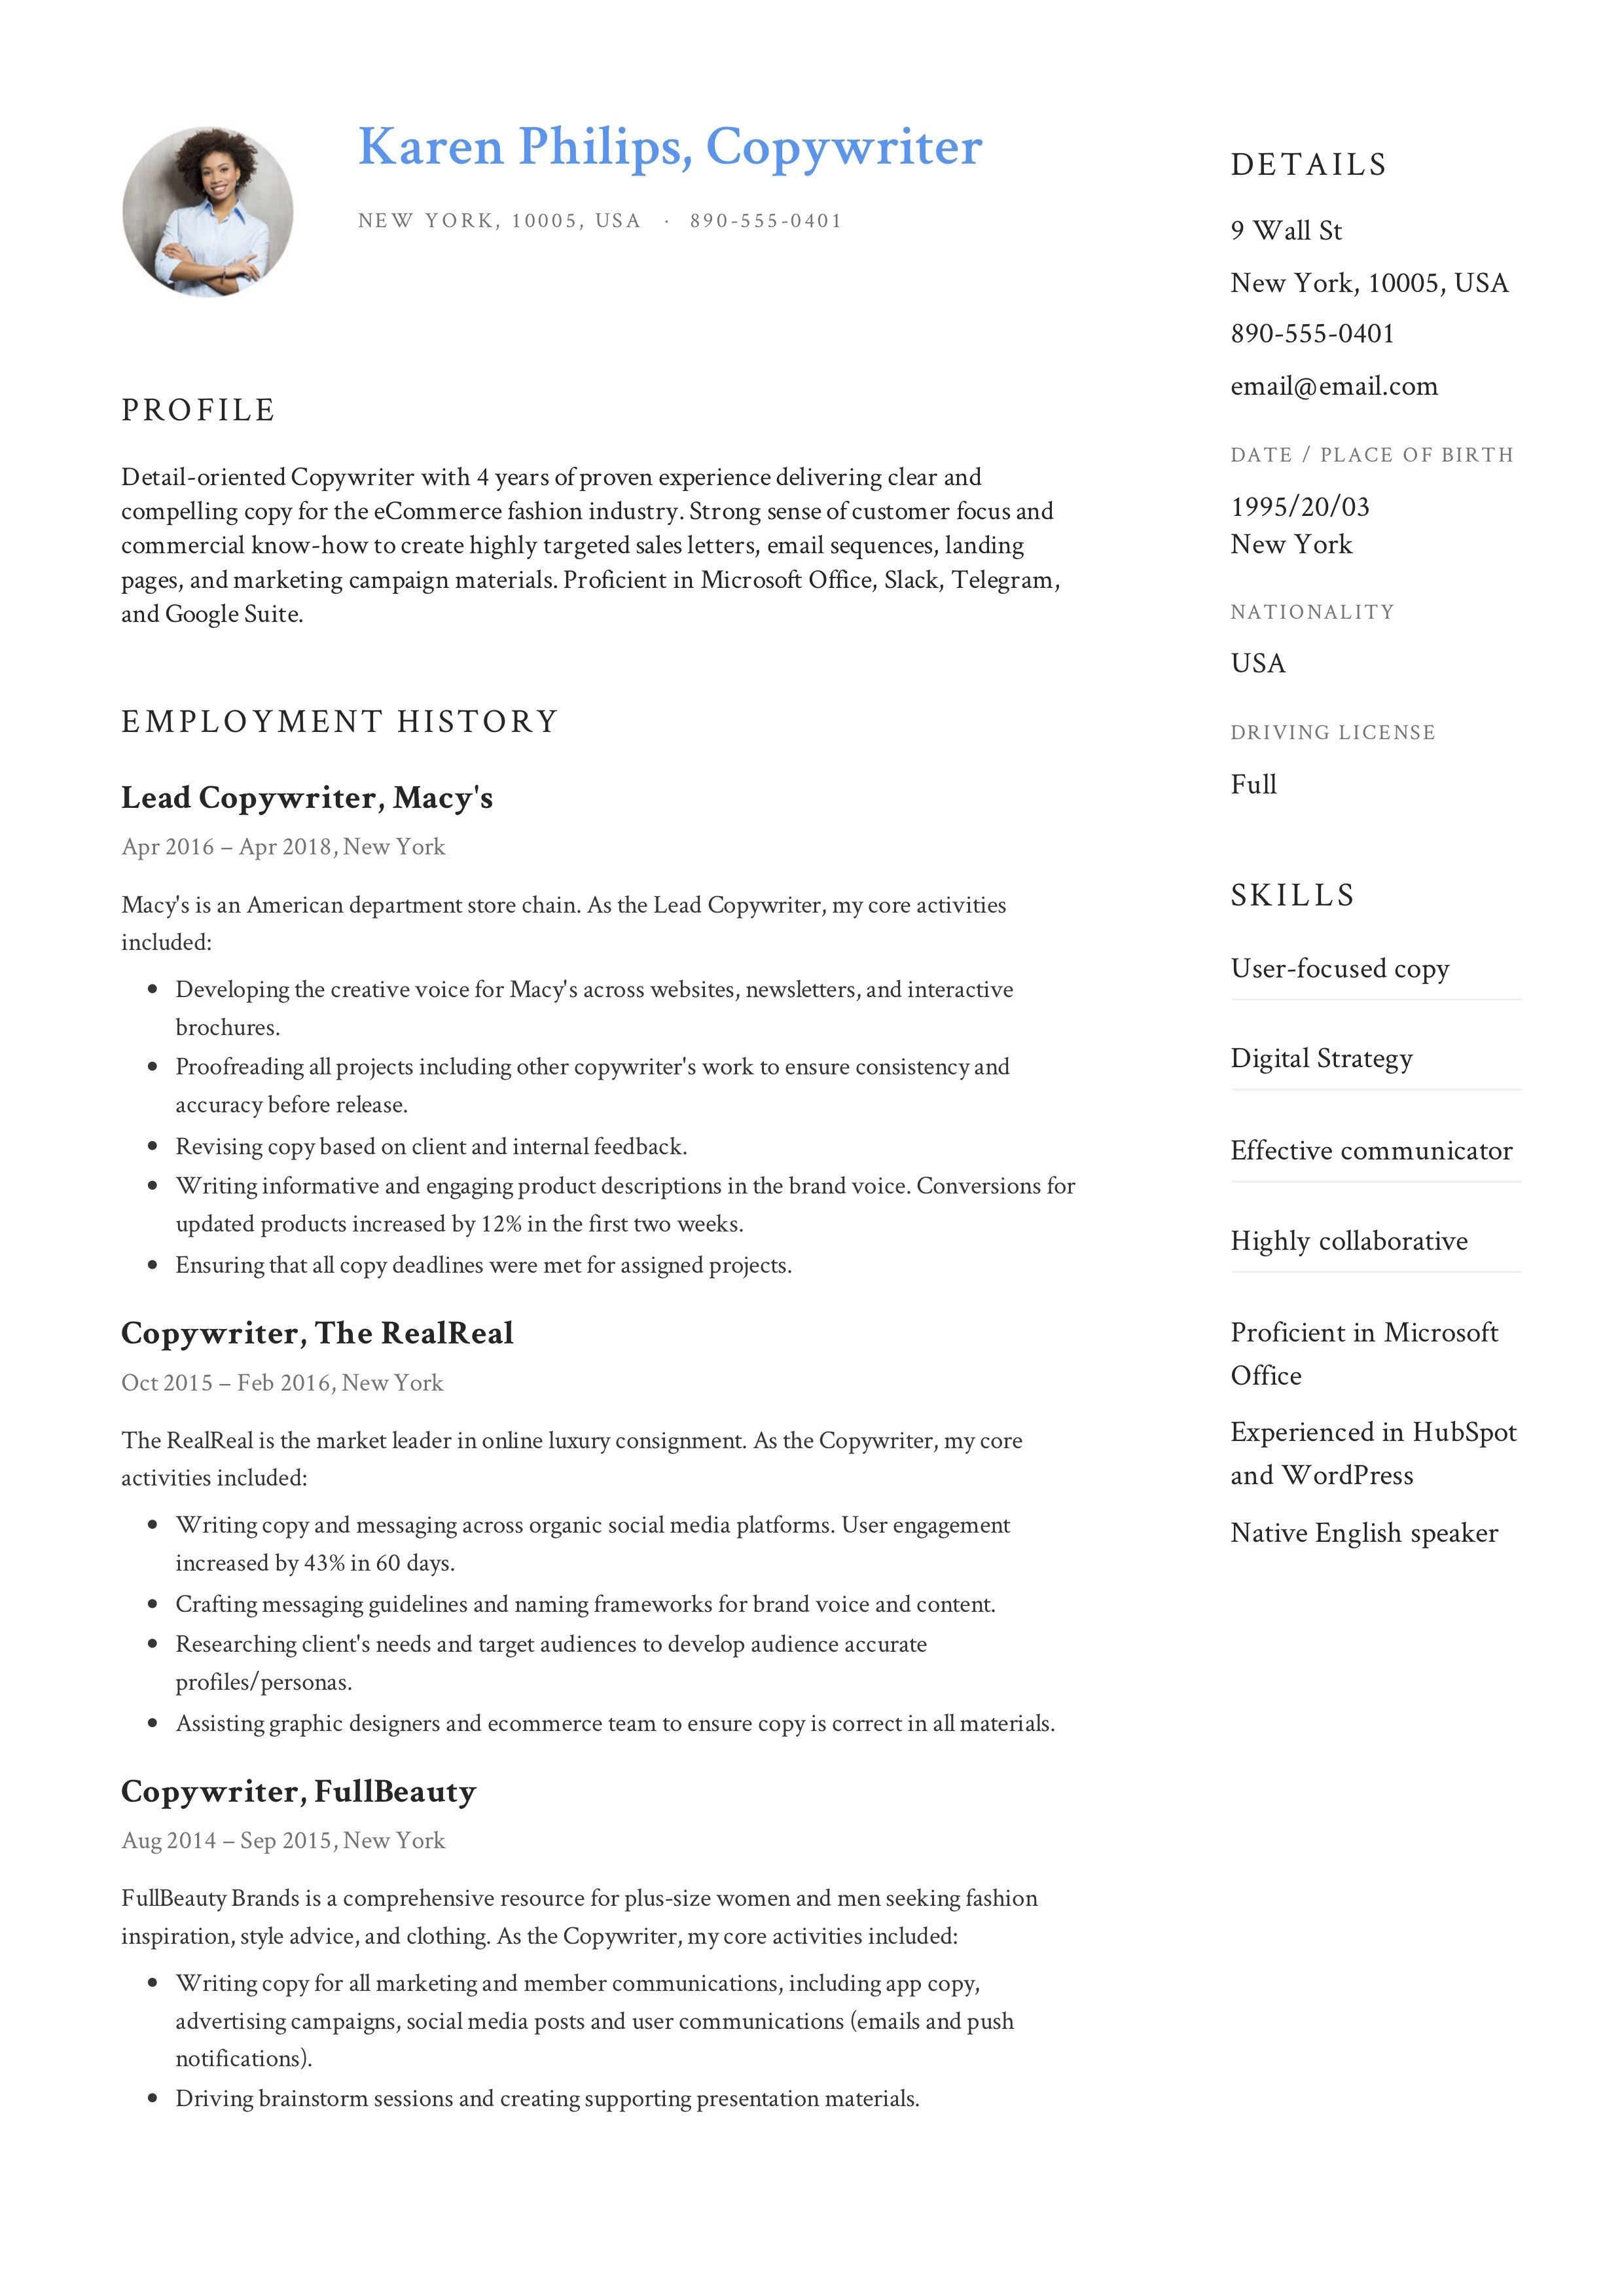 Copywriter Resume, template, design, tips, examples, free